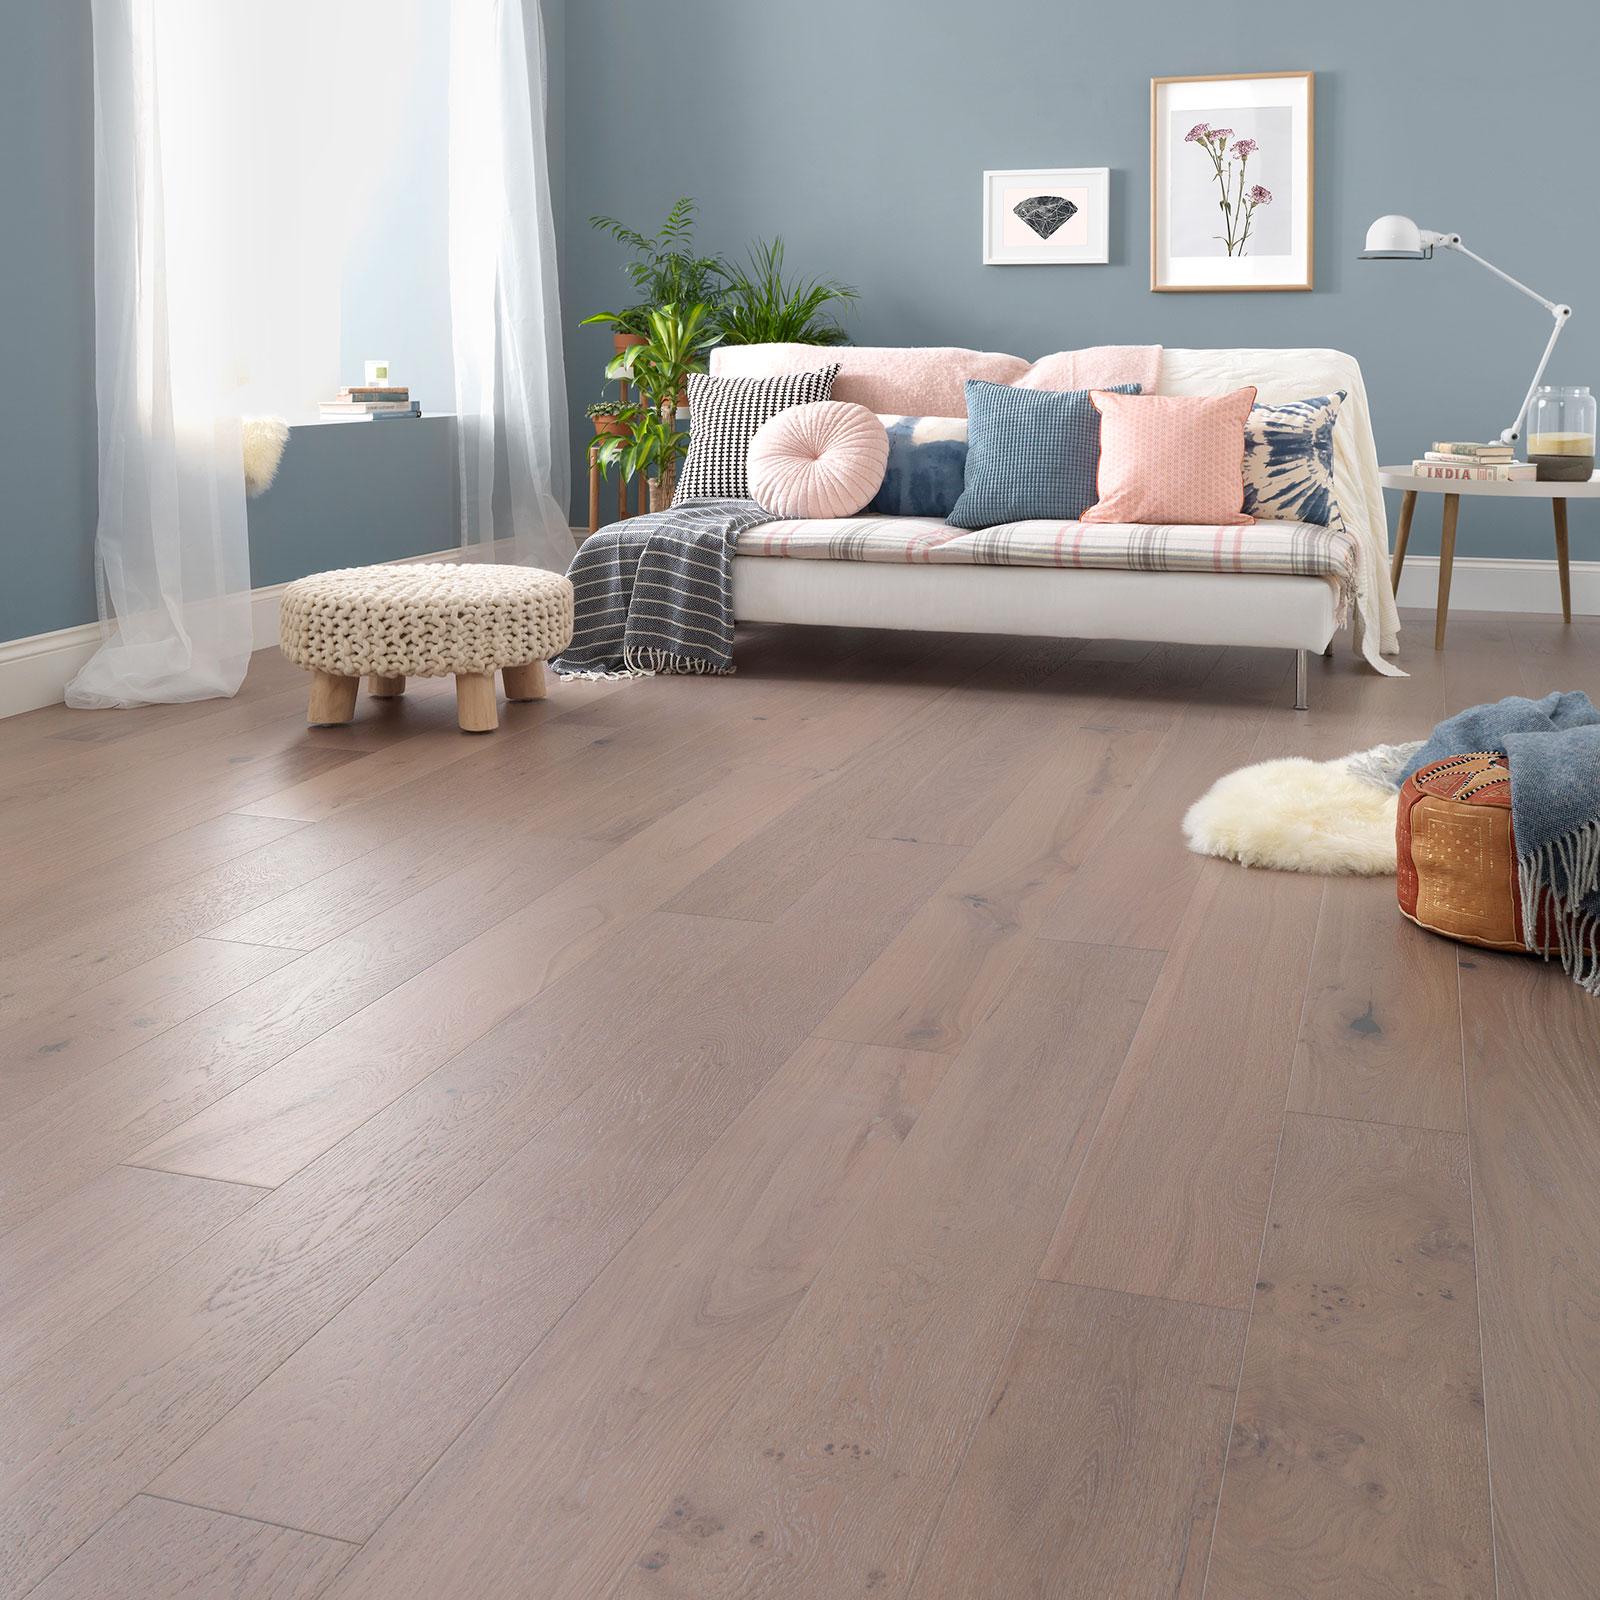 salcombe moonbeam oak flooring roomset